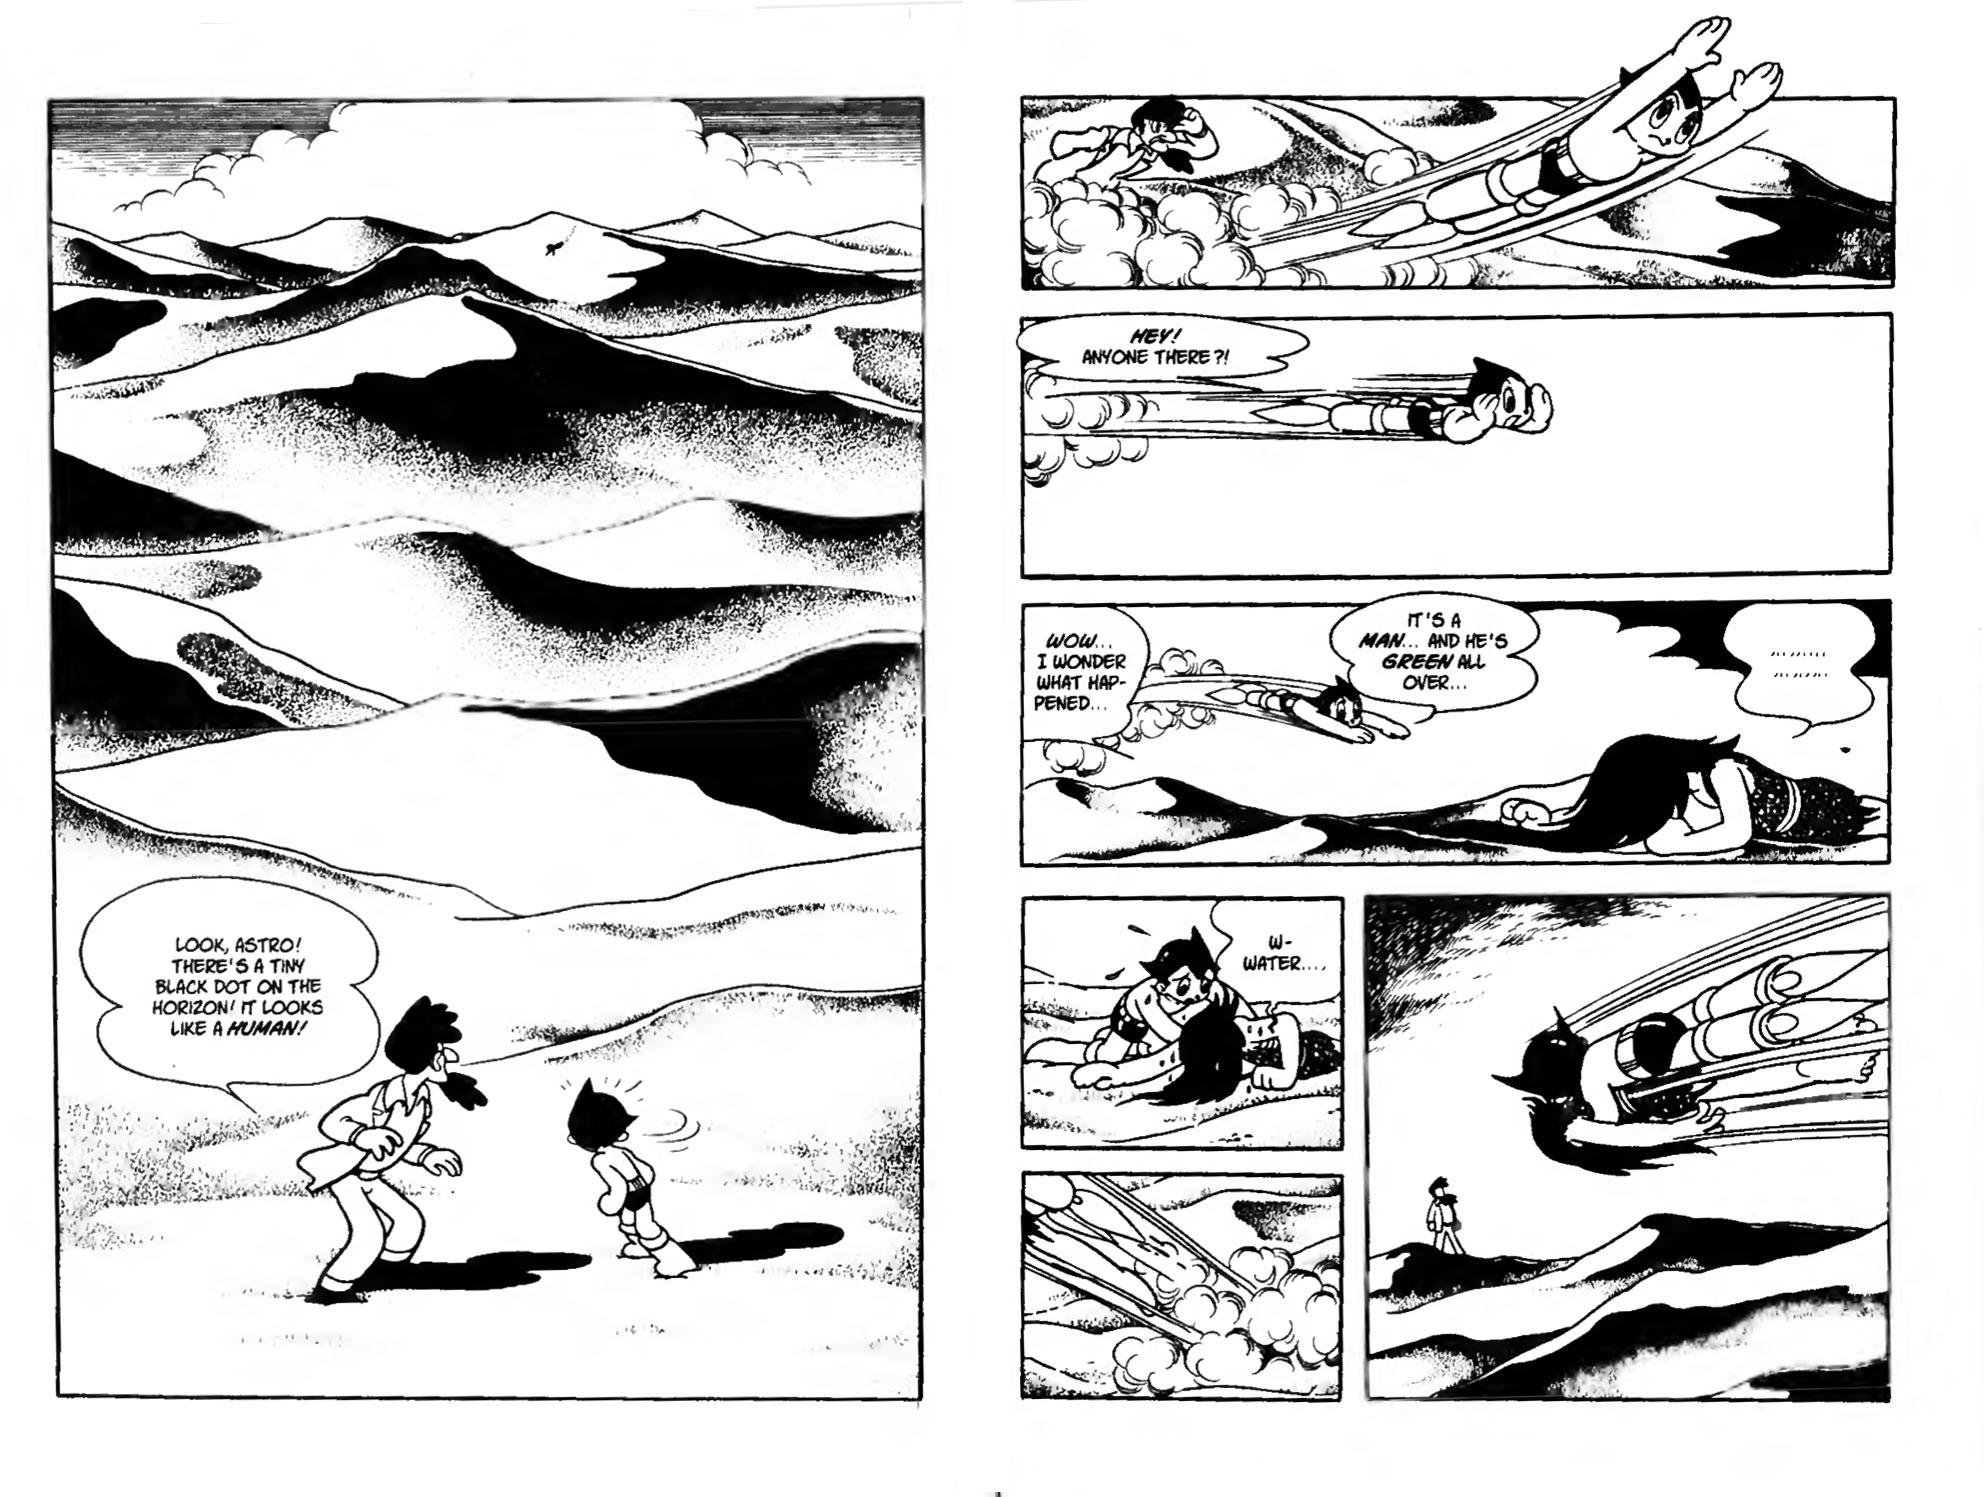 Astro Boy 20 review